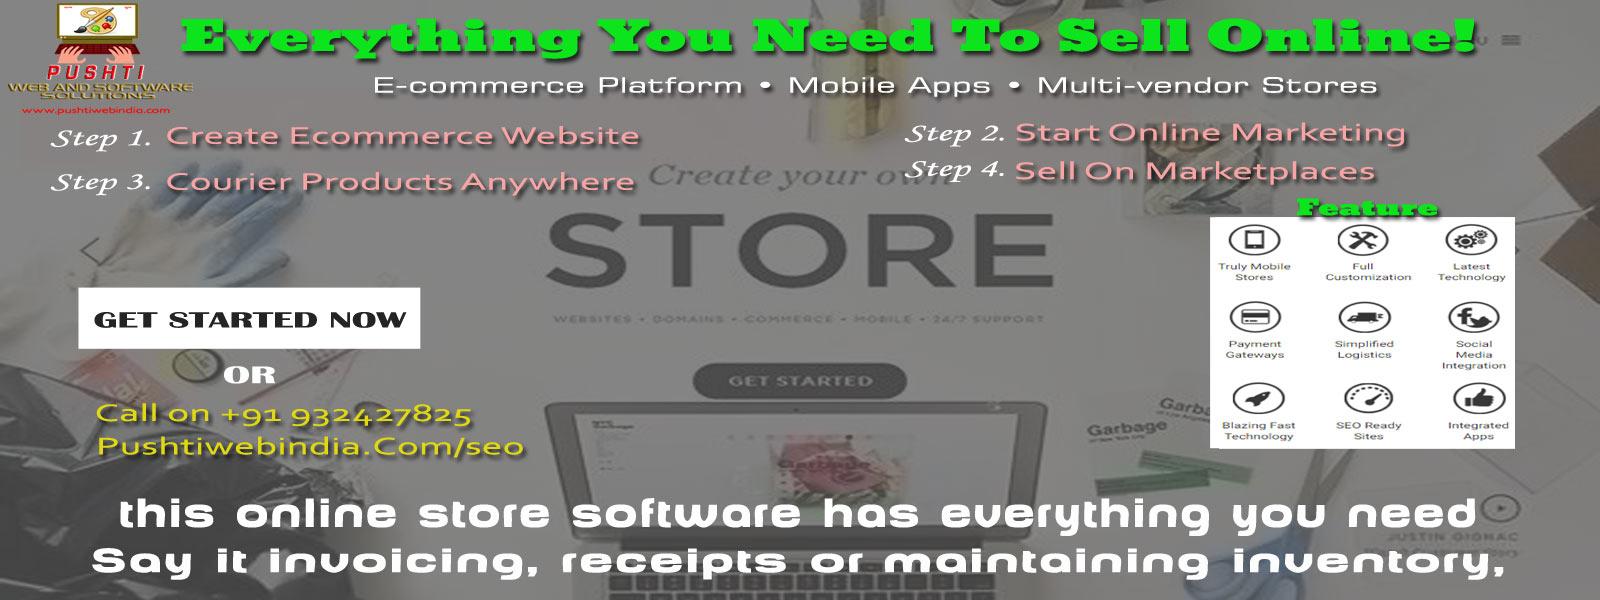 ecommerce website, ecommerce software, multi vendor store, e-commerce platform, ecommerce mobile app